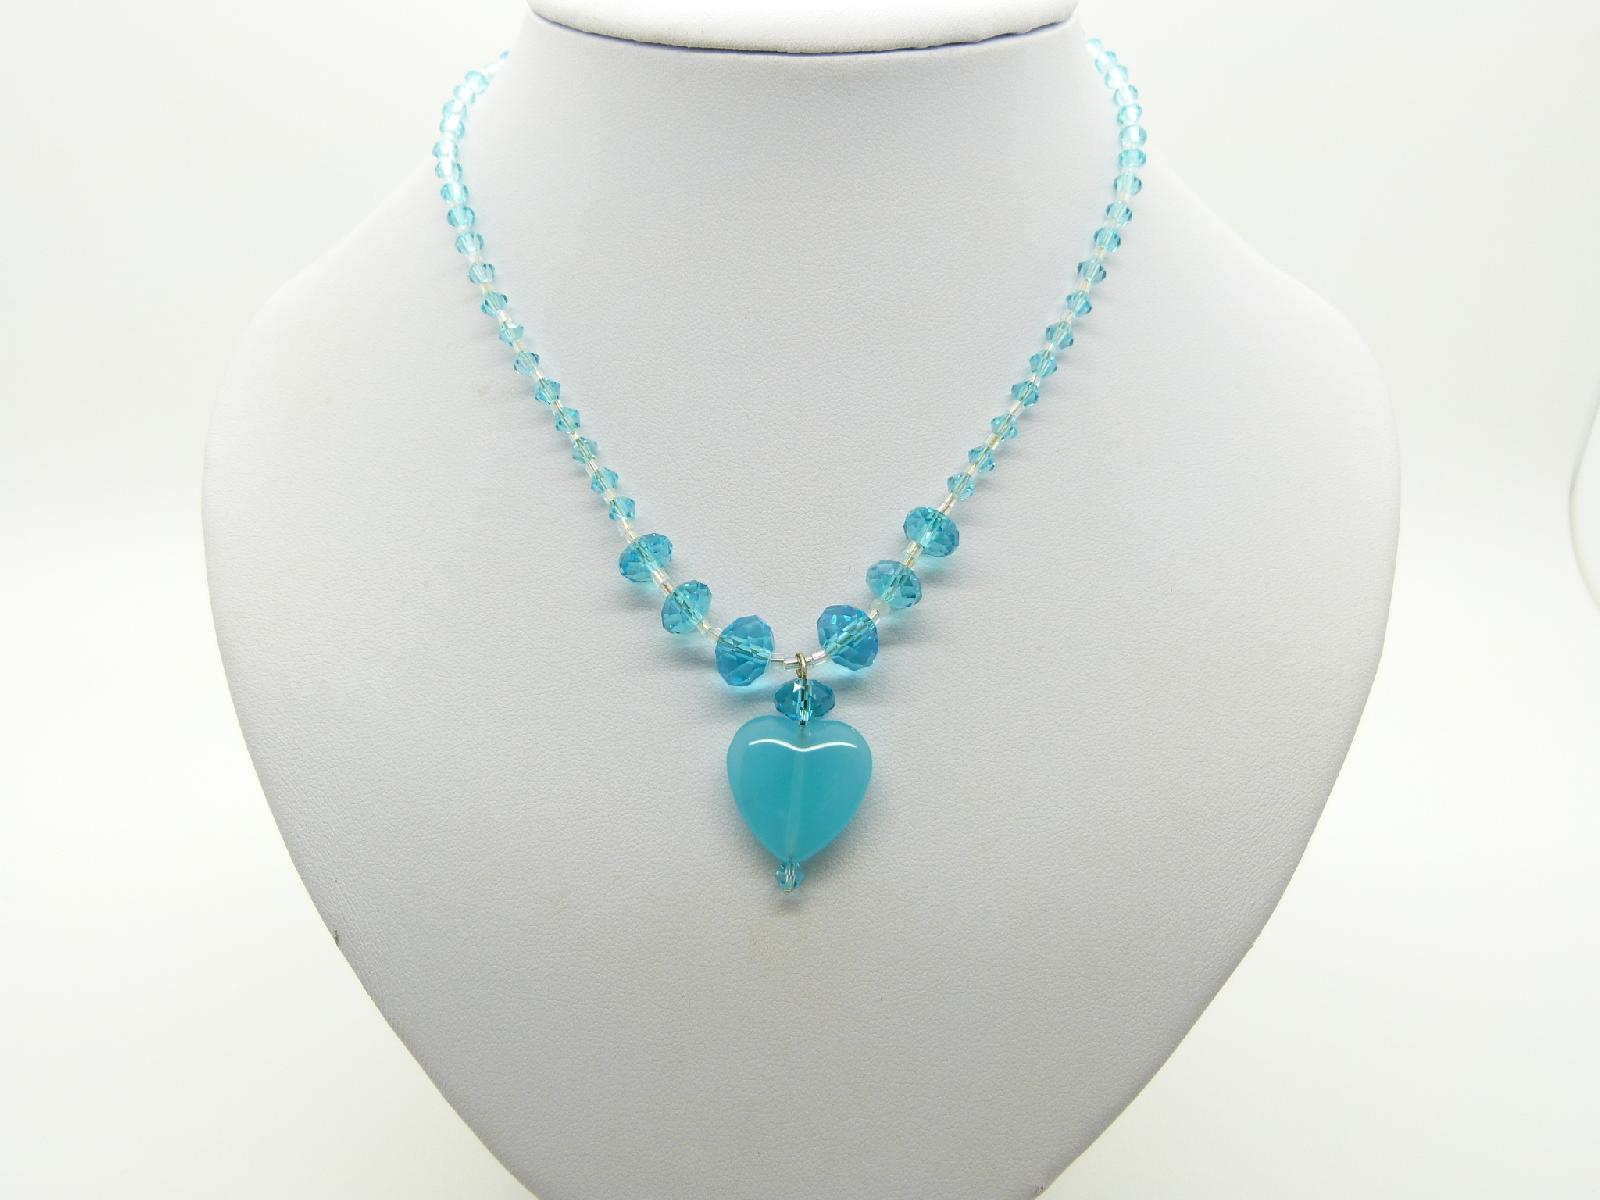 Vintage Redesigned Aqua Blue Crystal Bead Necklace Glass Heart Pendant